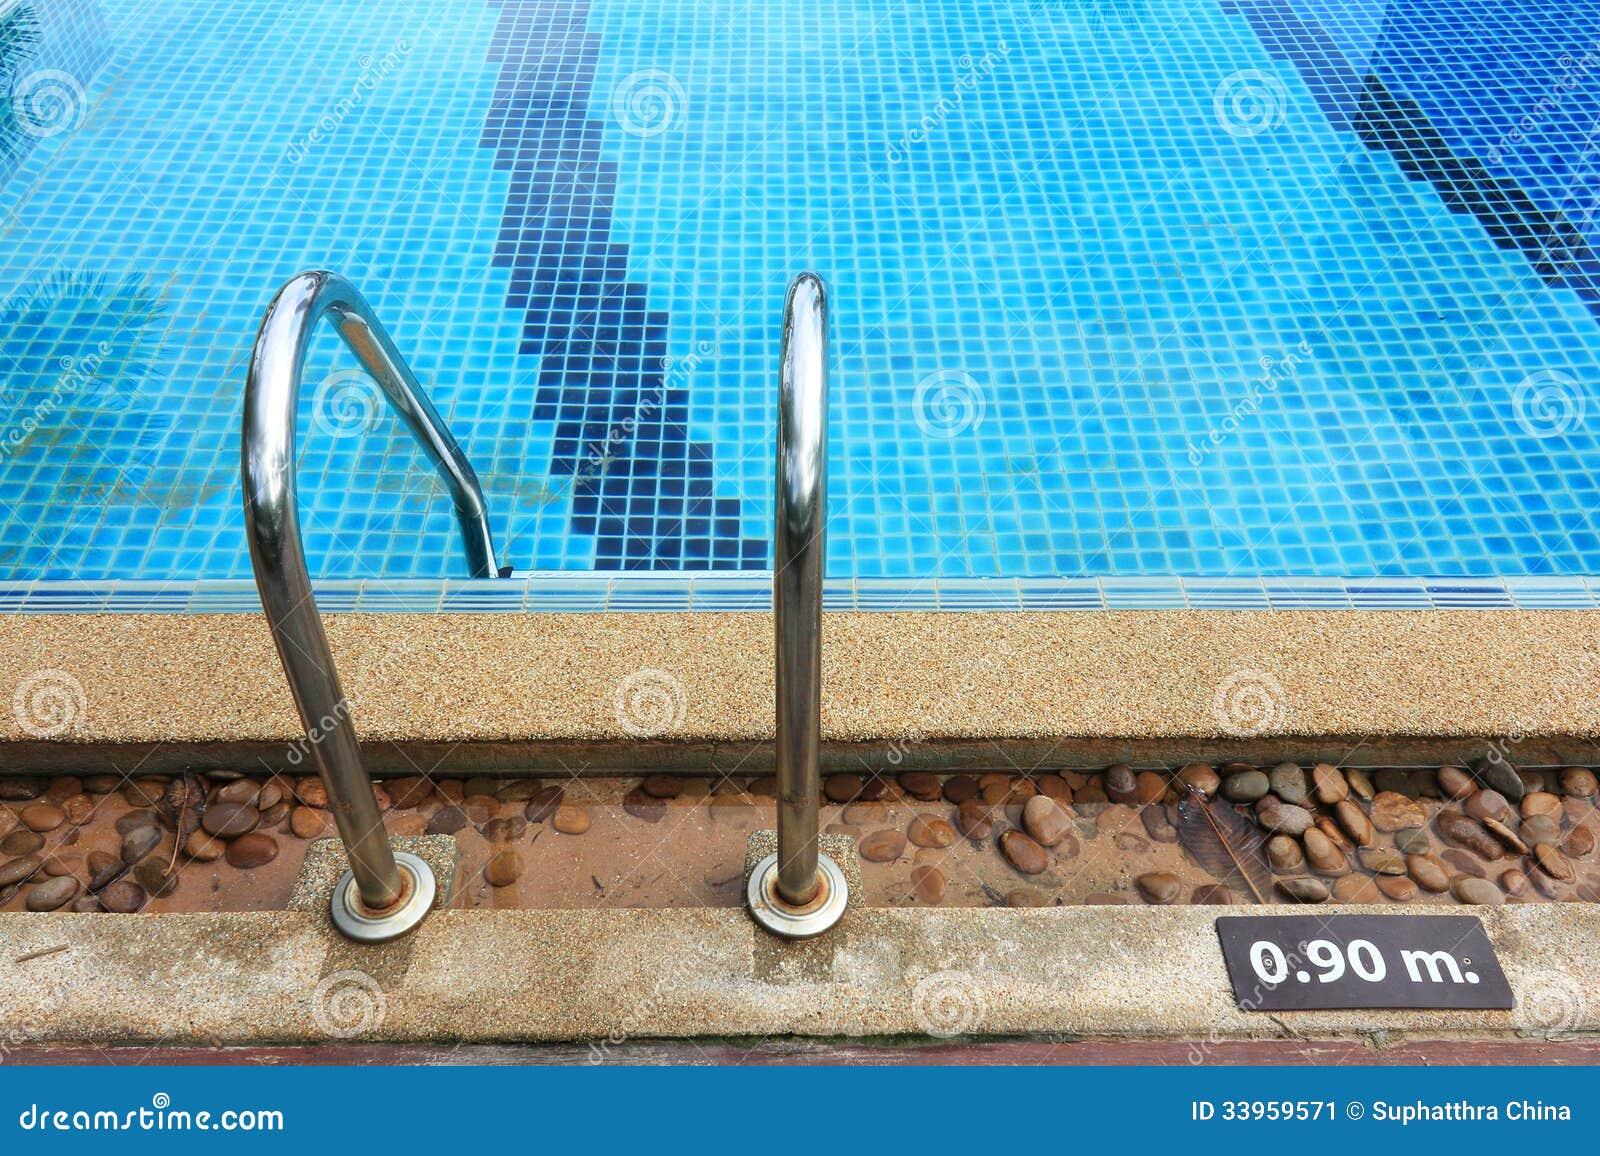 Swimming Pool Depth Marker Stock Image Image 33959571